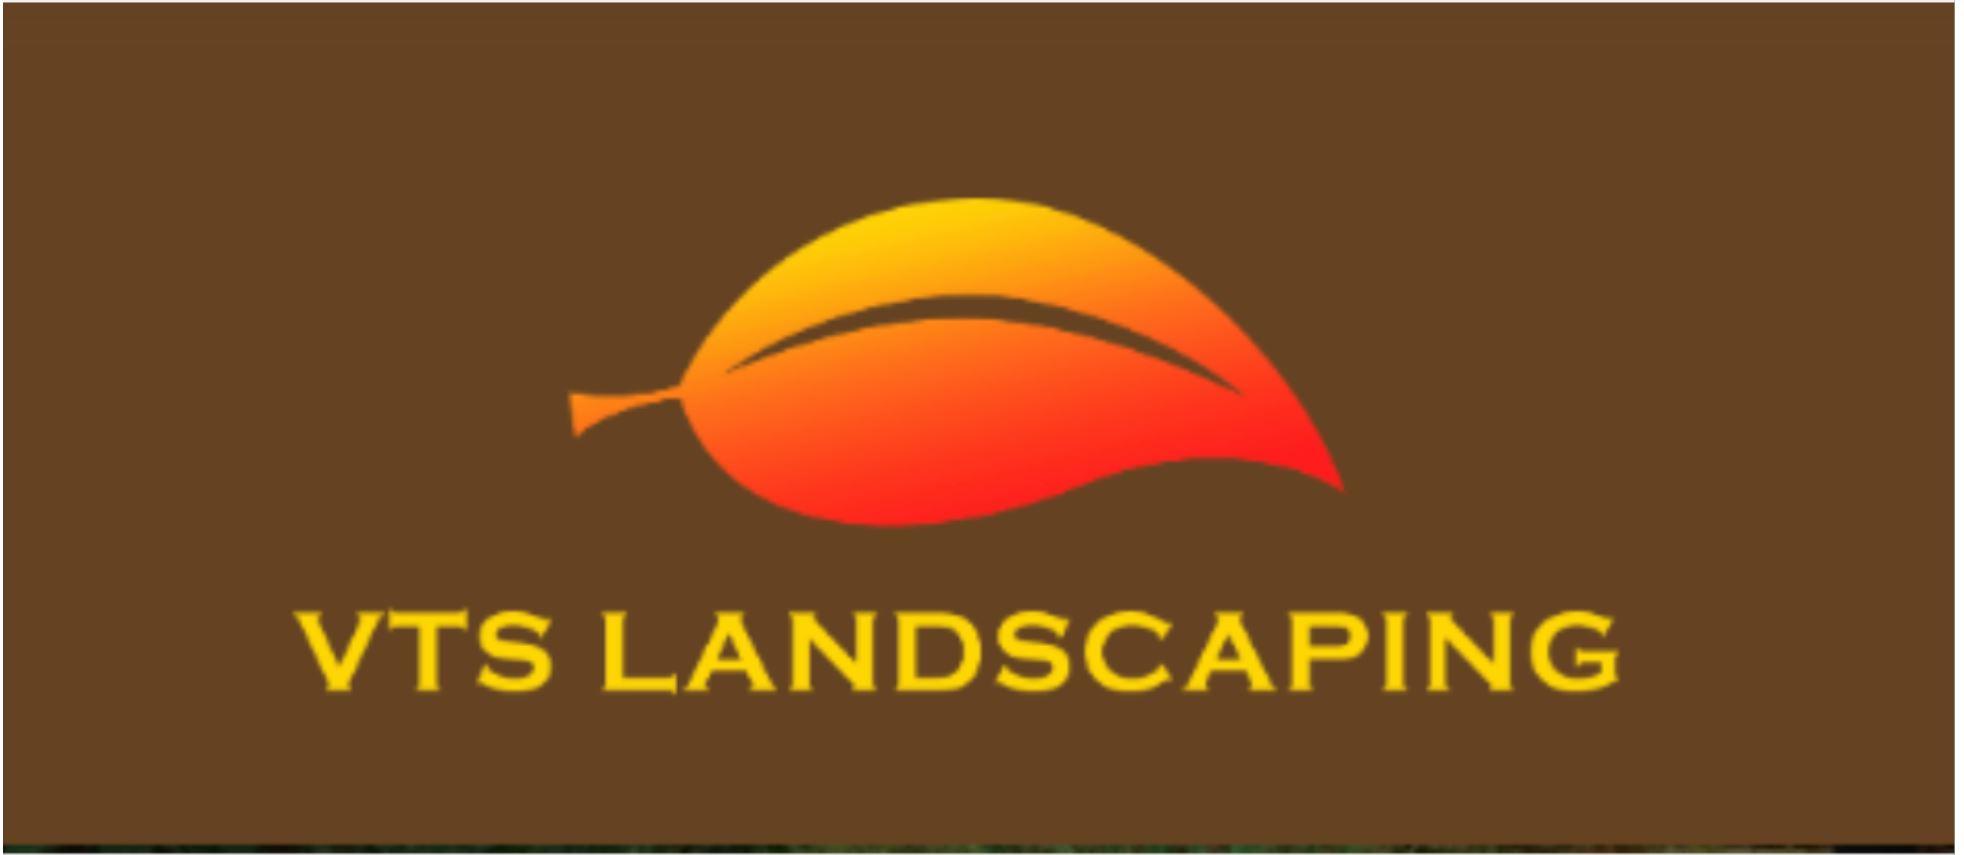 VTS Landscaping